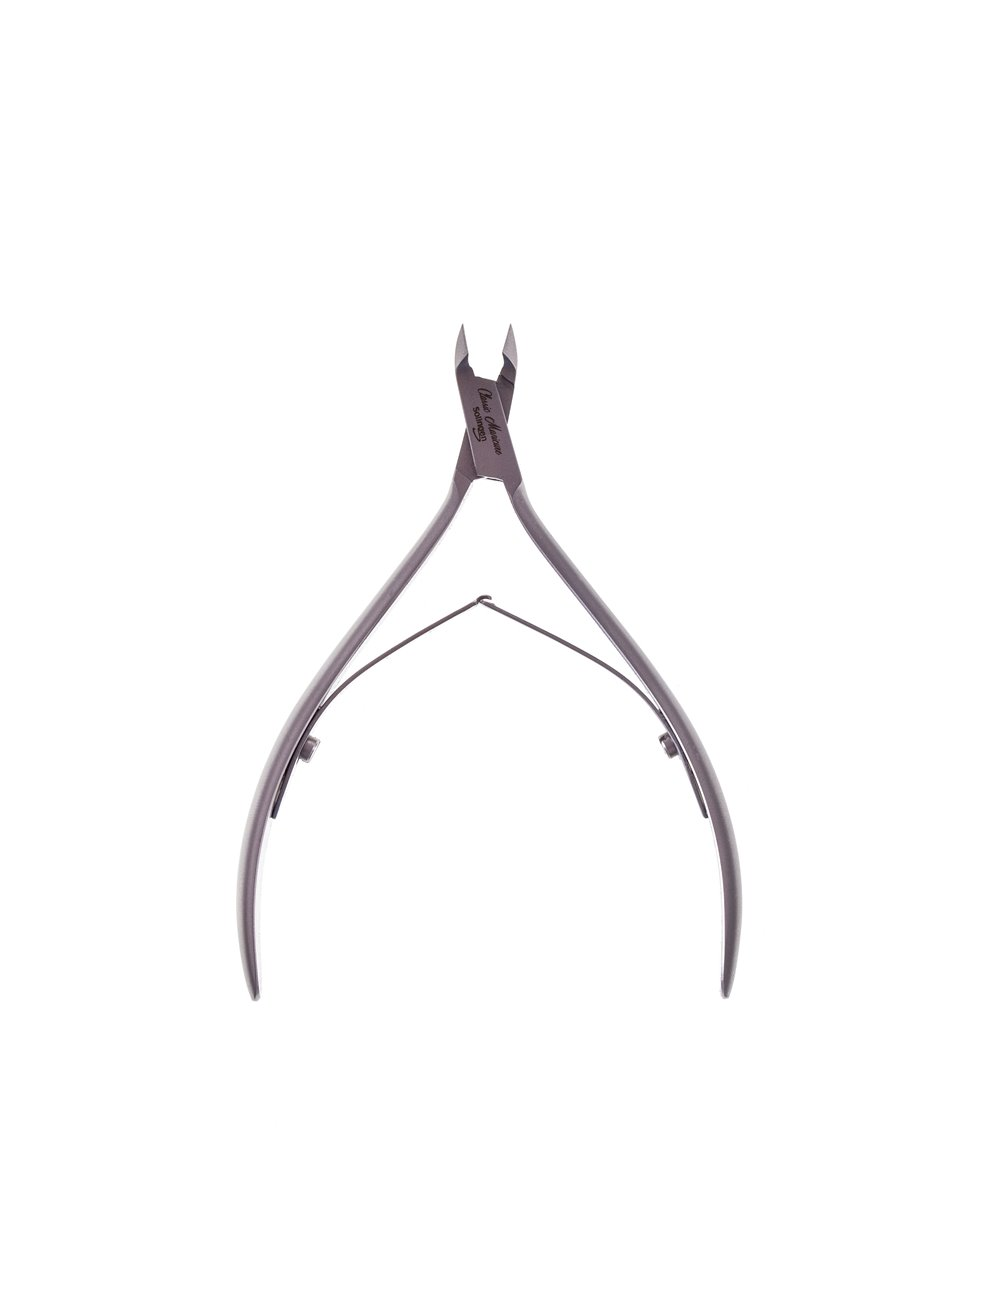 Cążki do skórek PRO - Solingen - podwójna sprężyna, ostrze 5 mm